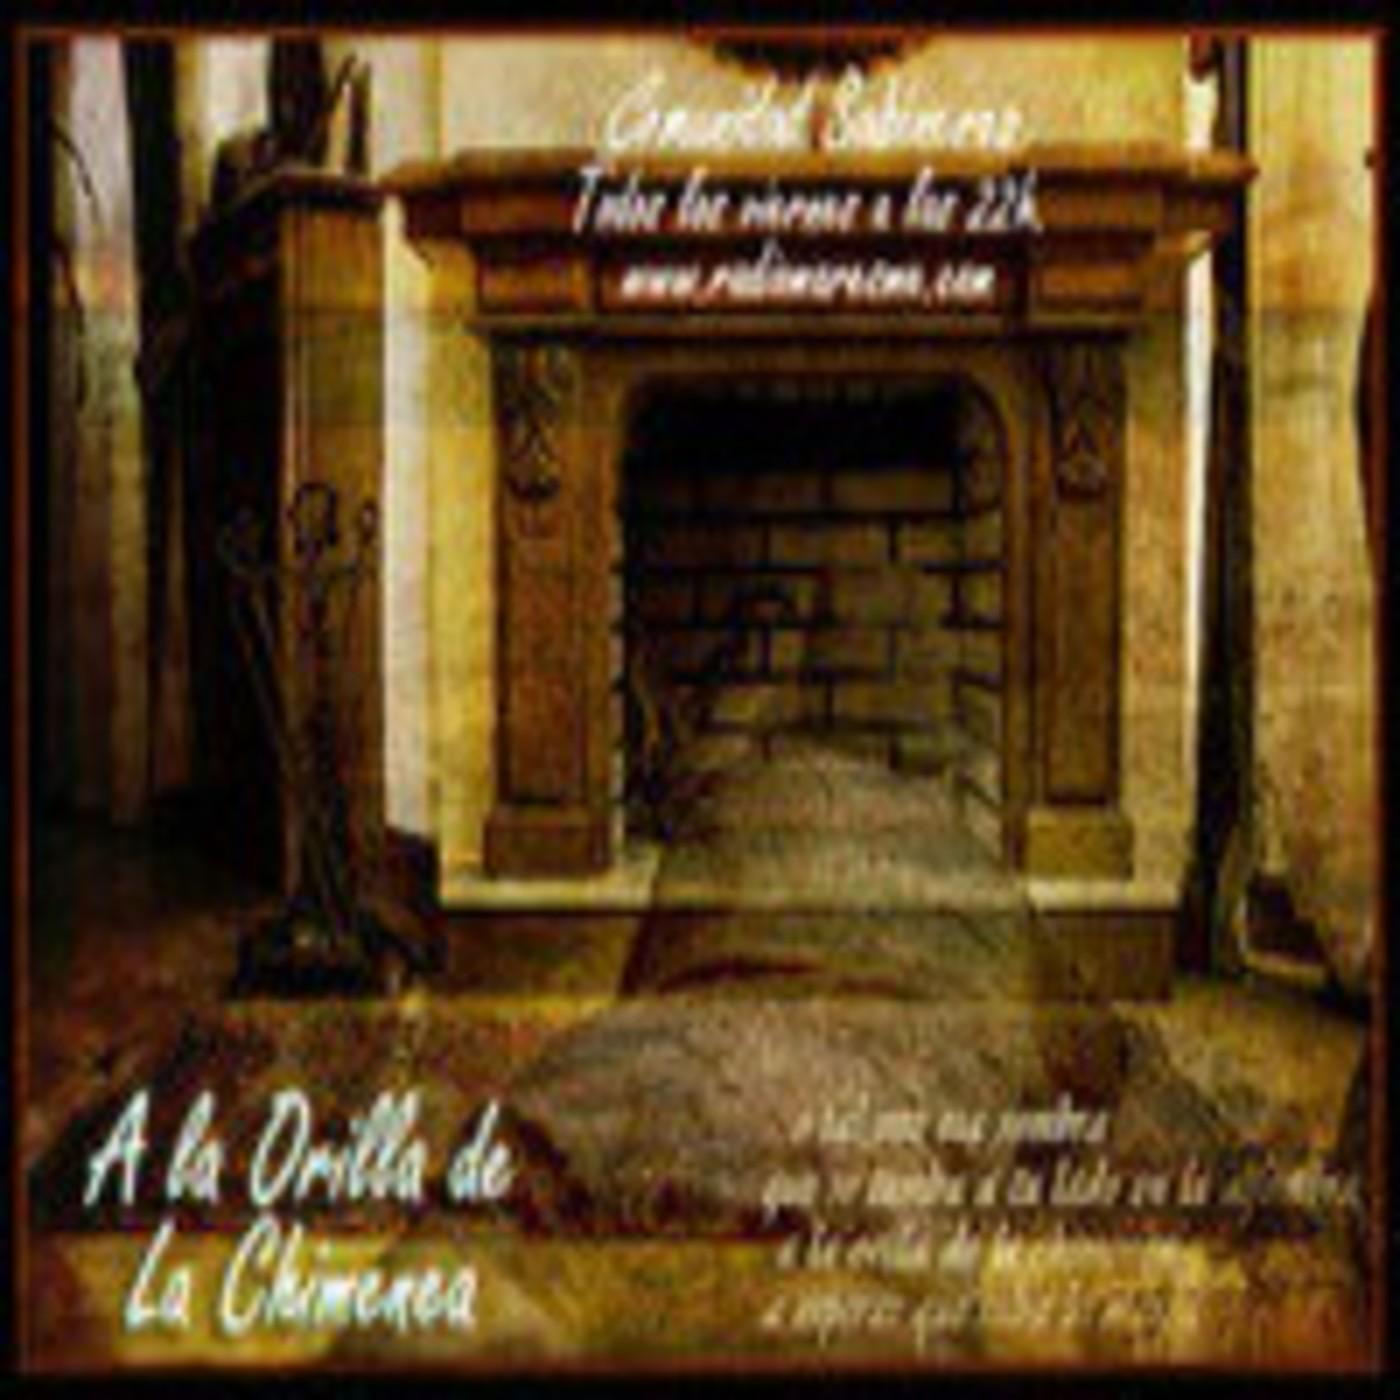 6 A La Orilla De La Chimenea Entrevista A Paula Seminara íntegro En Podcast A La Orilla De La Chimenea En Mp3 22 11 A Las 17 45 53 01 02 42 3768377 Ivoox